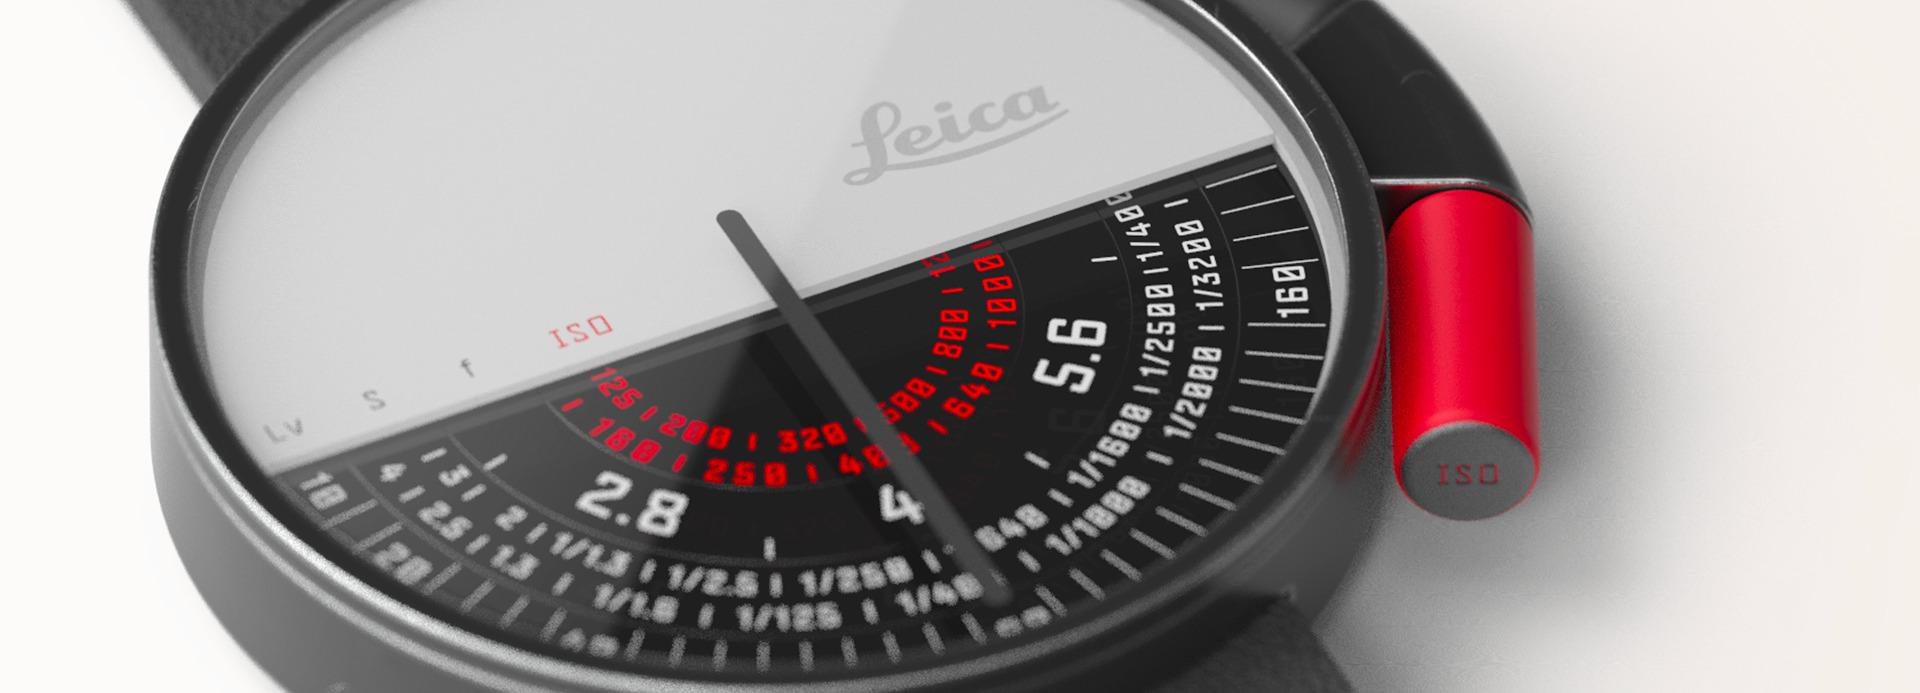 Leica Lightmeter